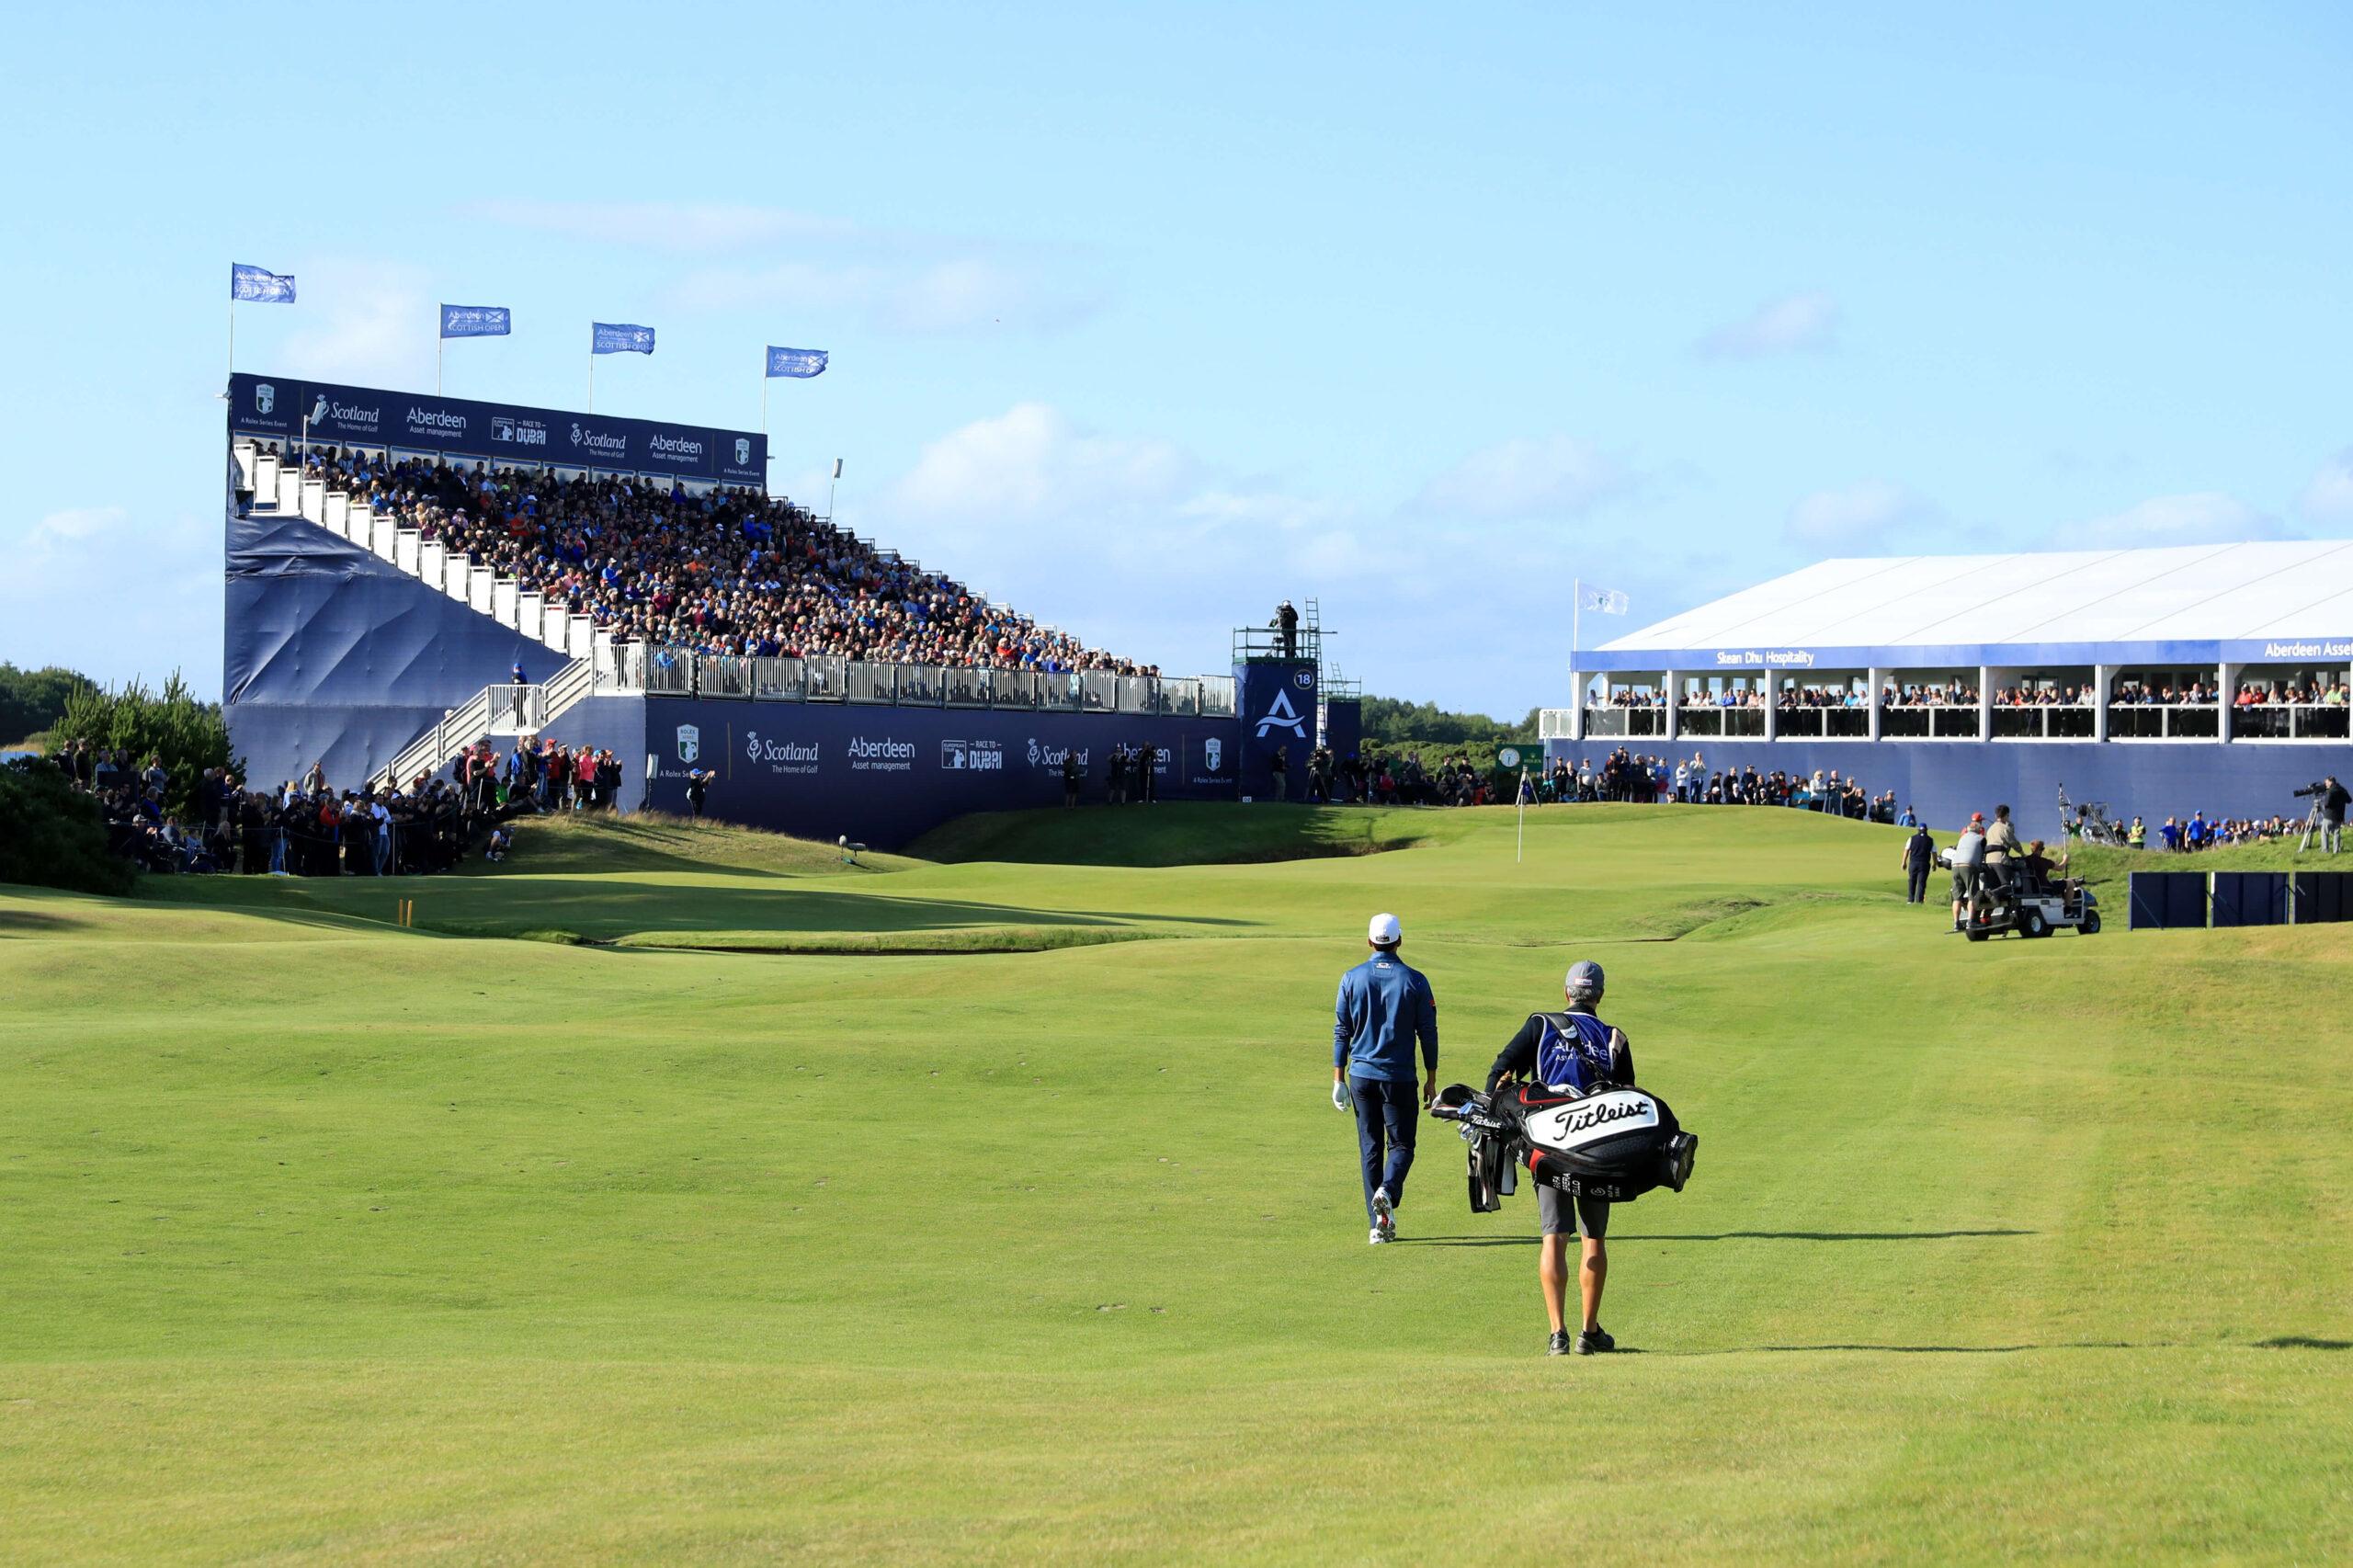 2017 Scottish Open